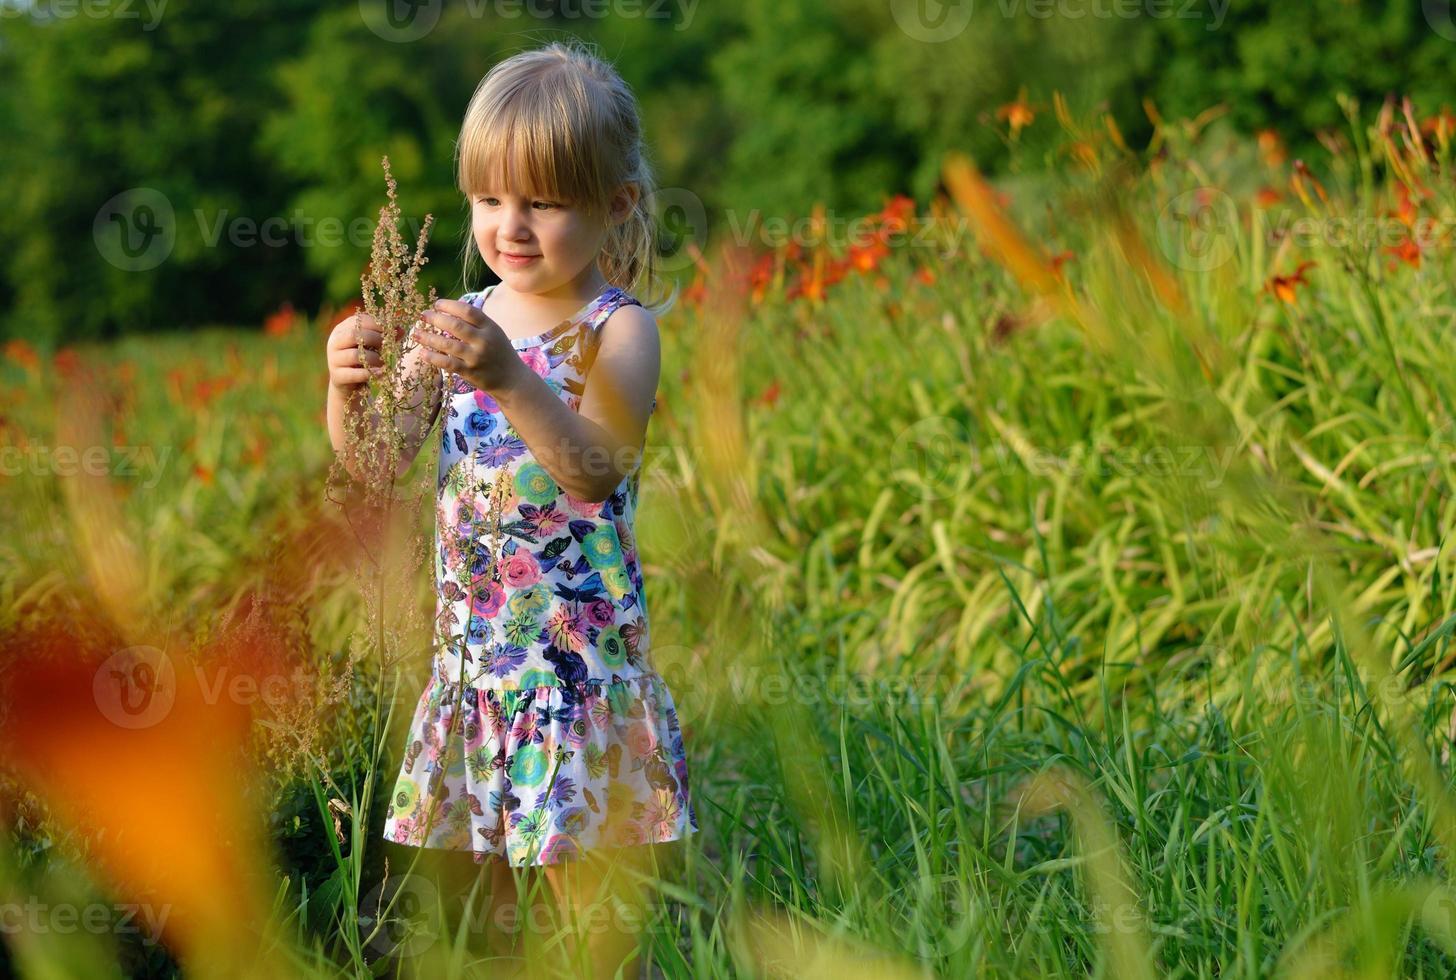 menina no Prado de flores. foto